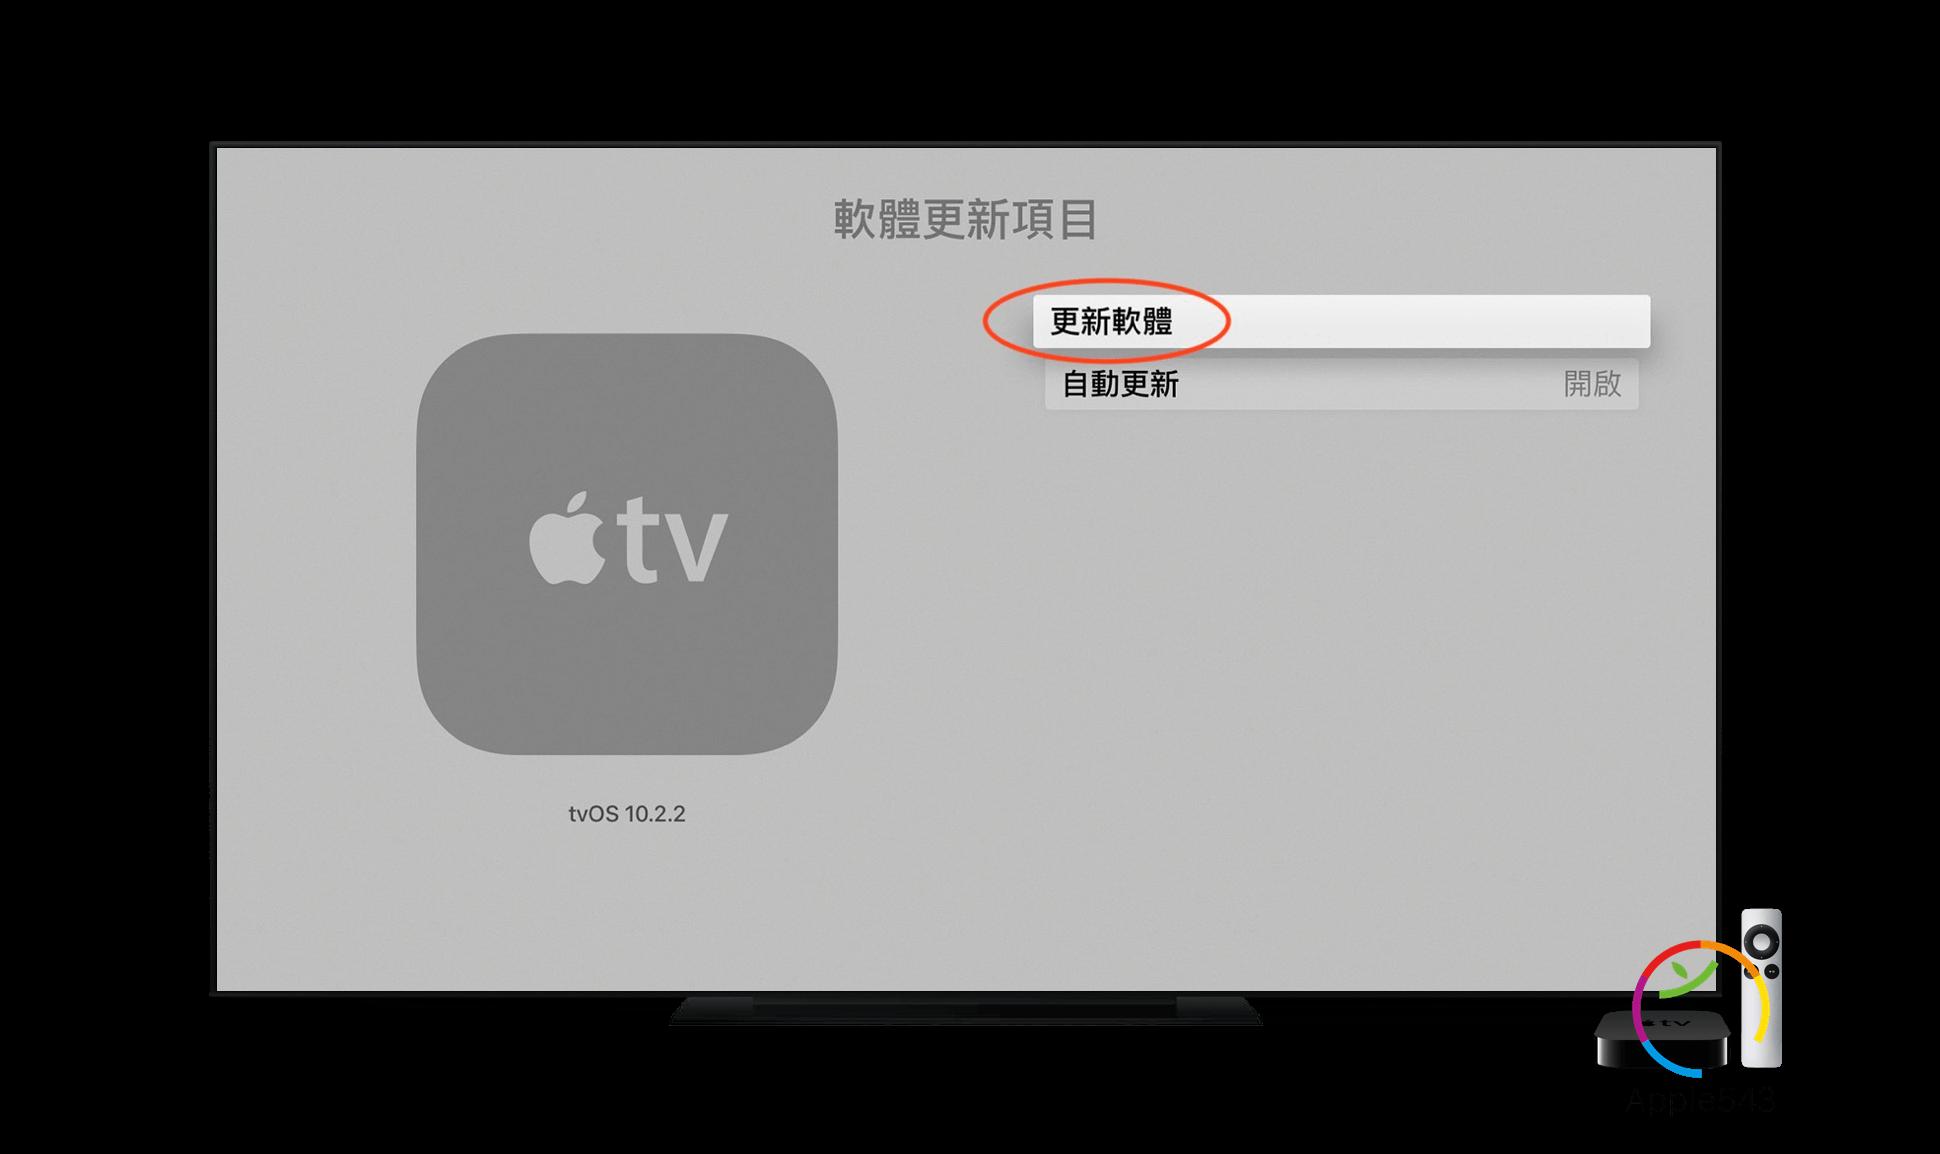 Apple TV 3 YouTube 暫停當機